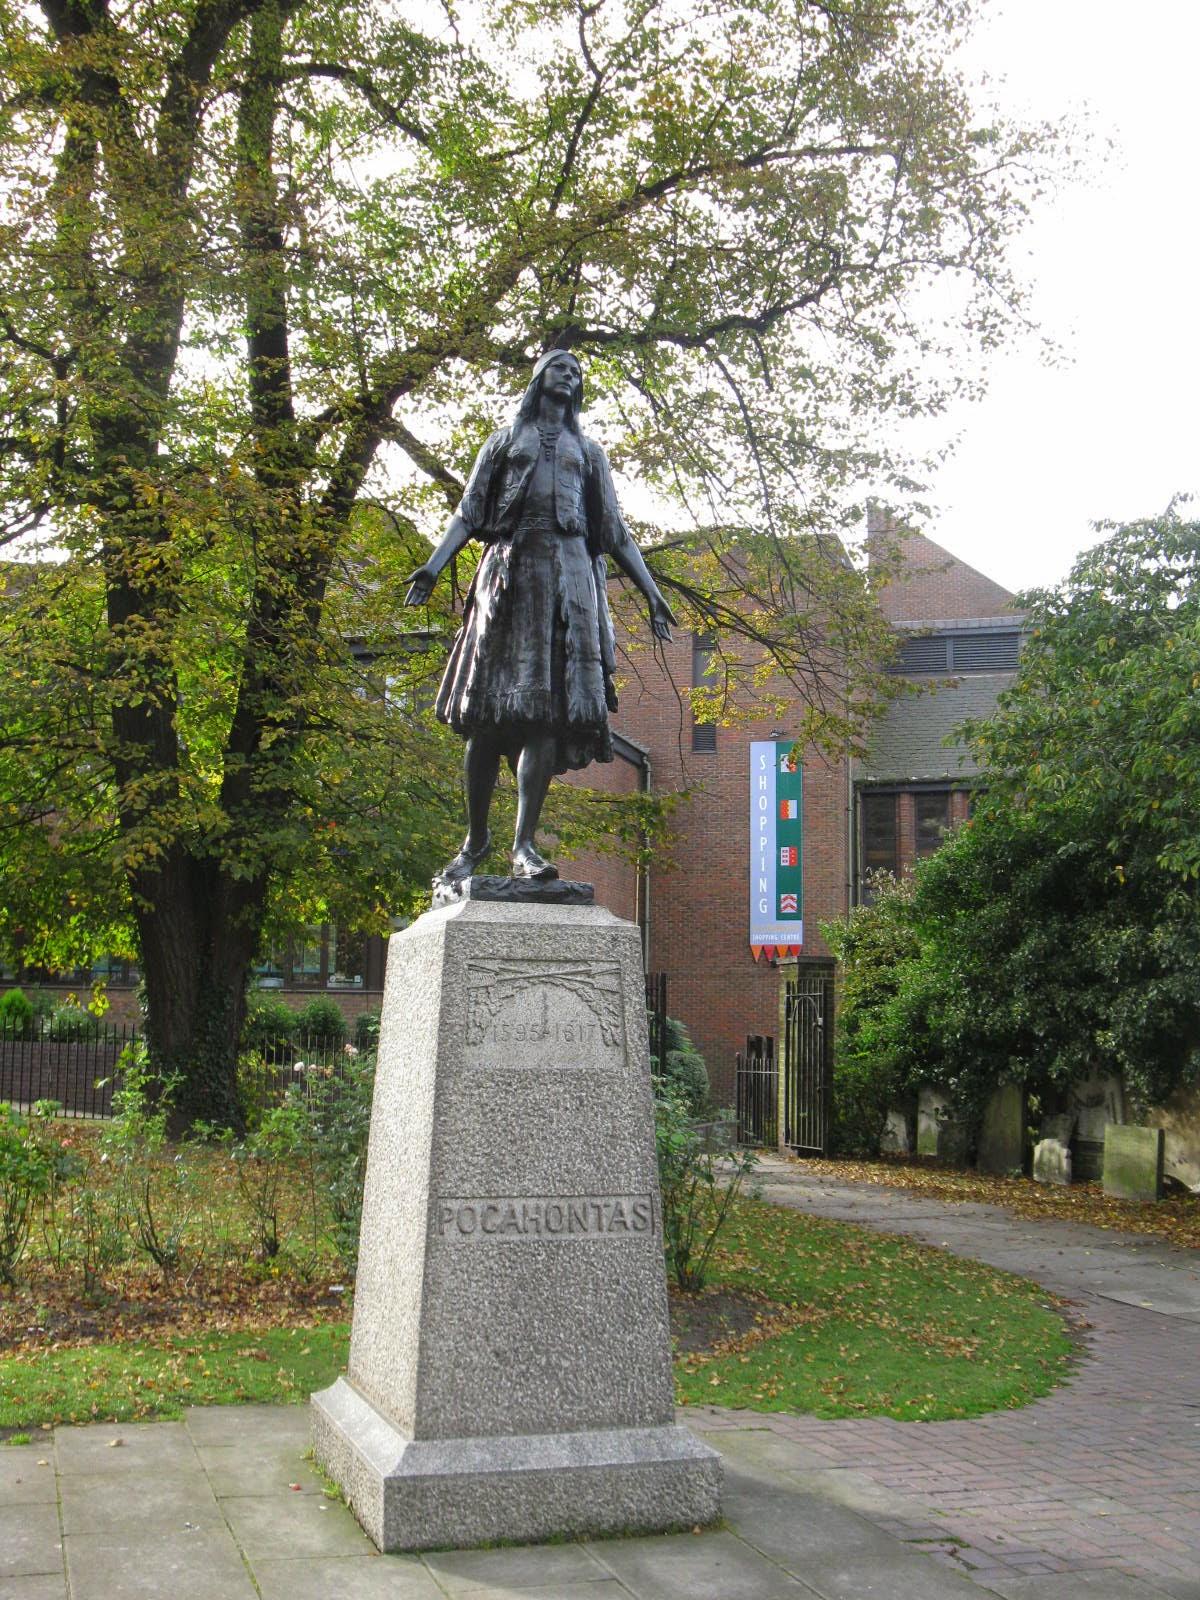 Pocahontas Monument, St. Georges Church, Gravesend, United Kingdom